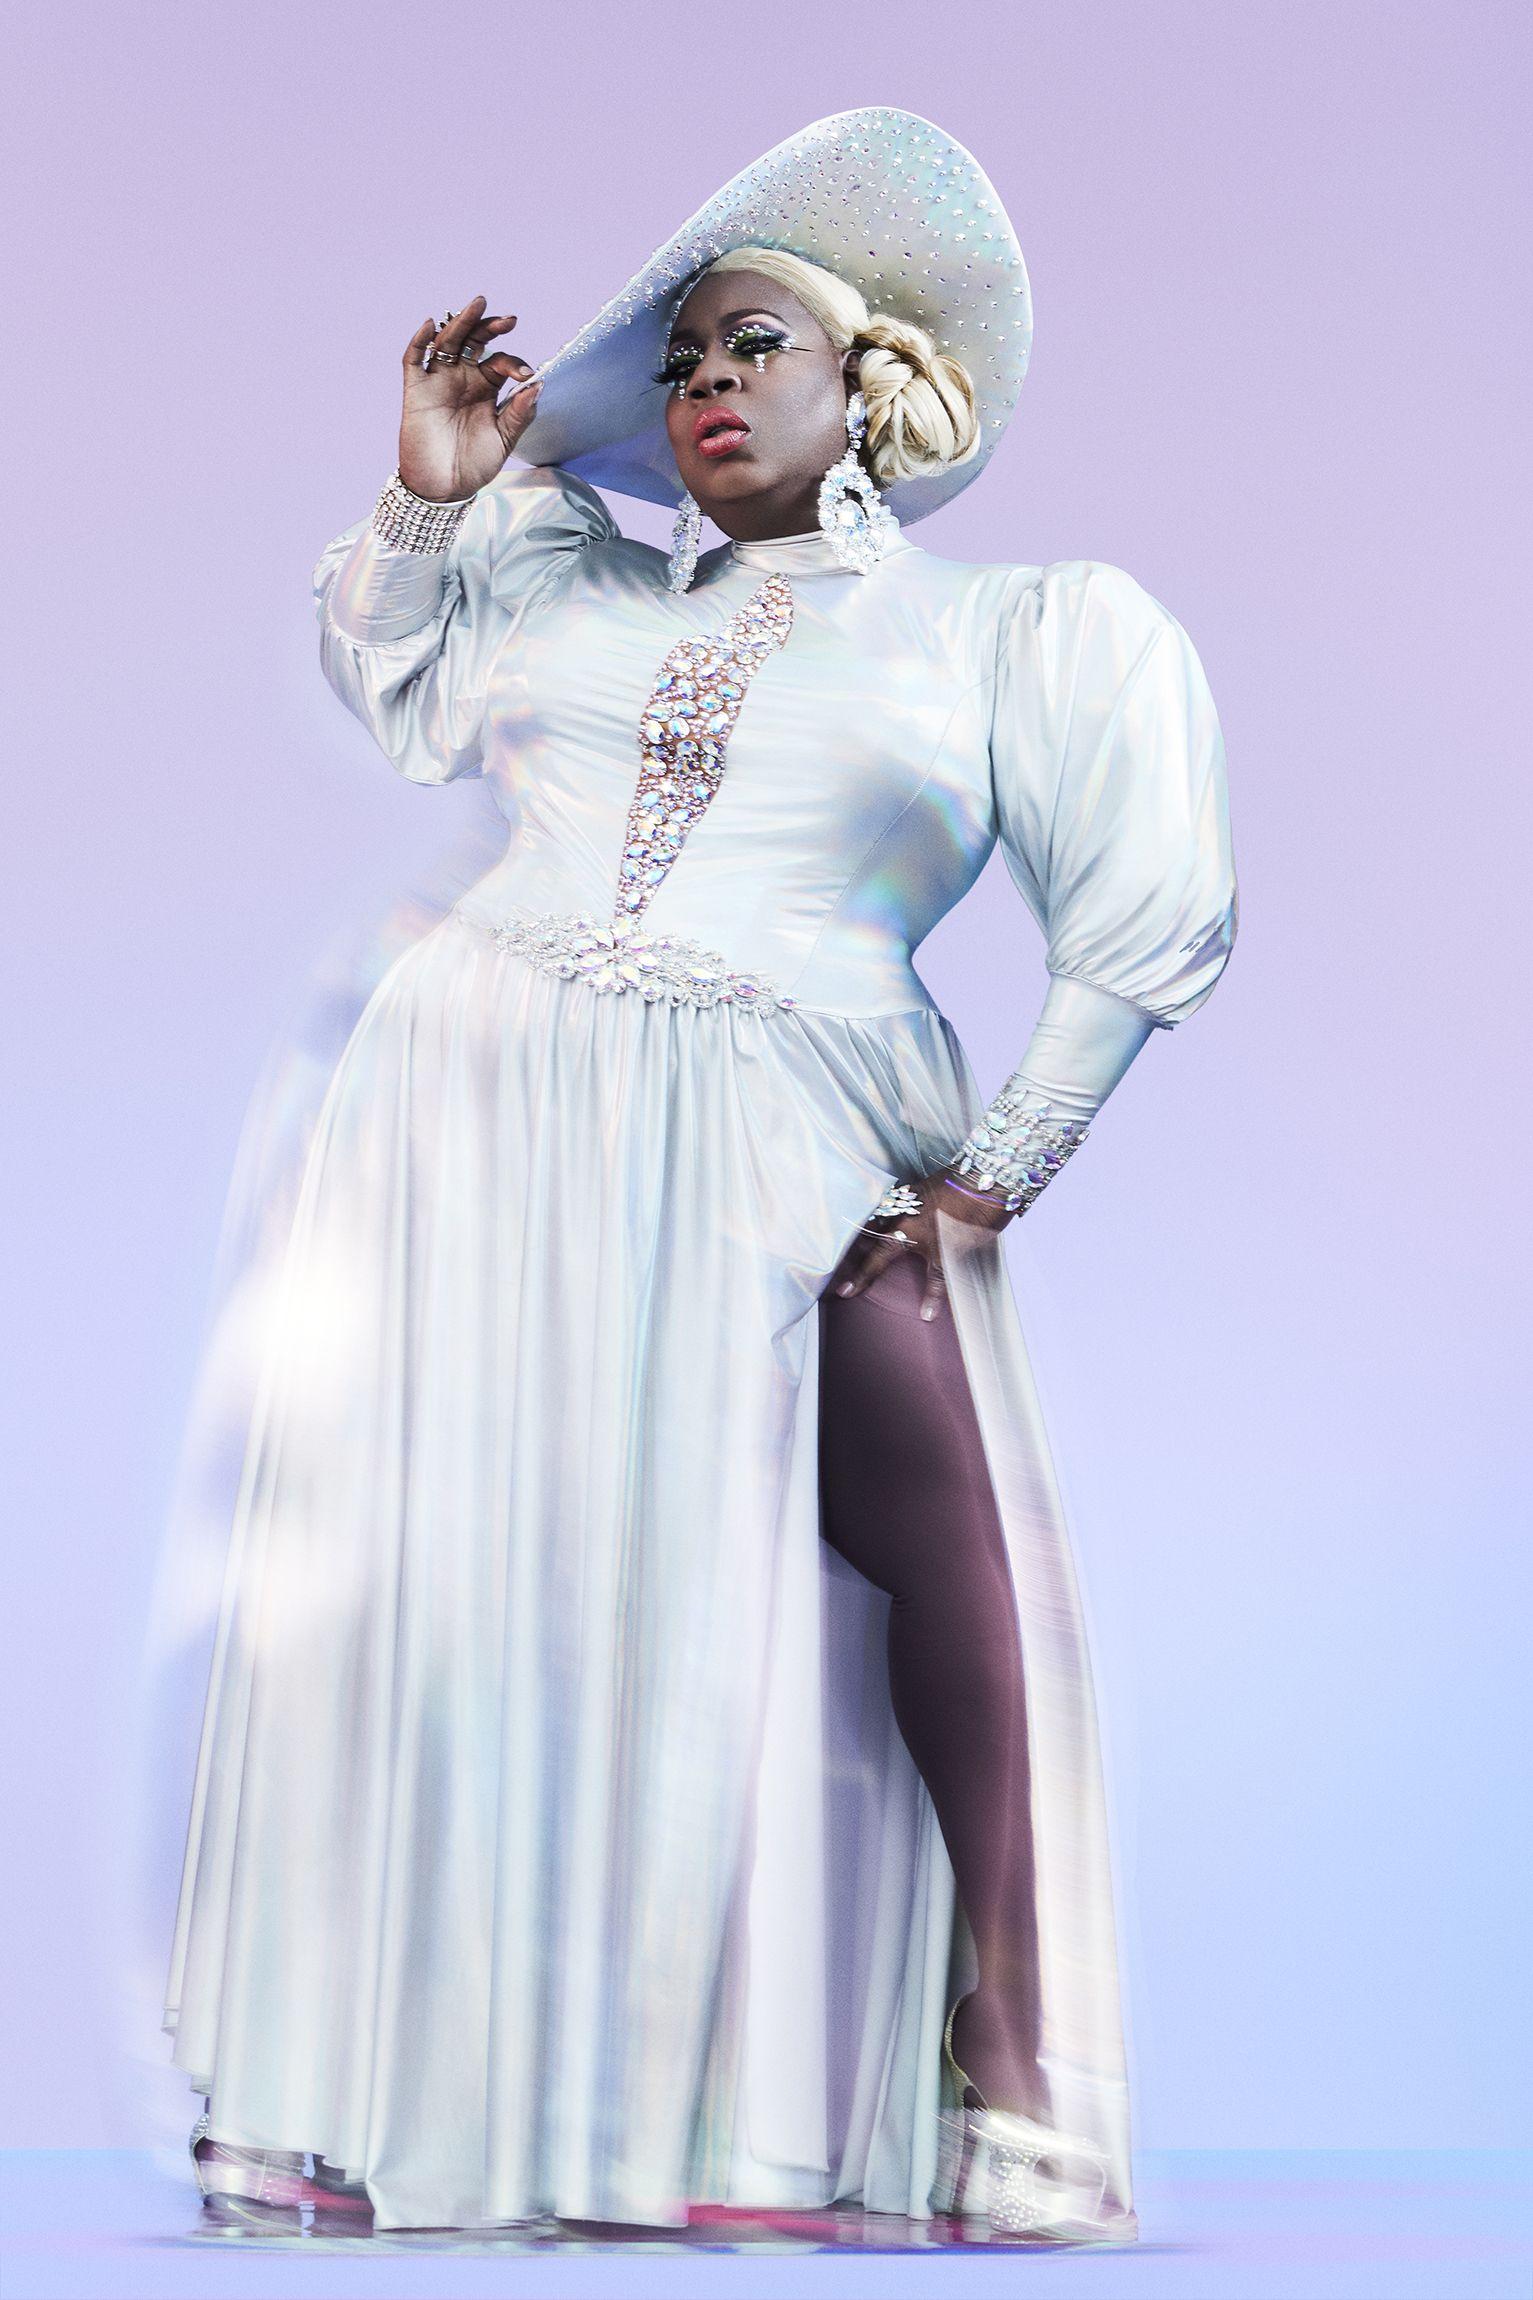 Latrice Royale   RuPaul's Drag Race Wiki   FANDOM powered by